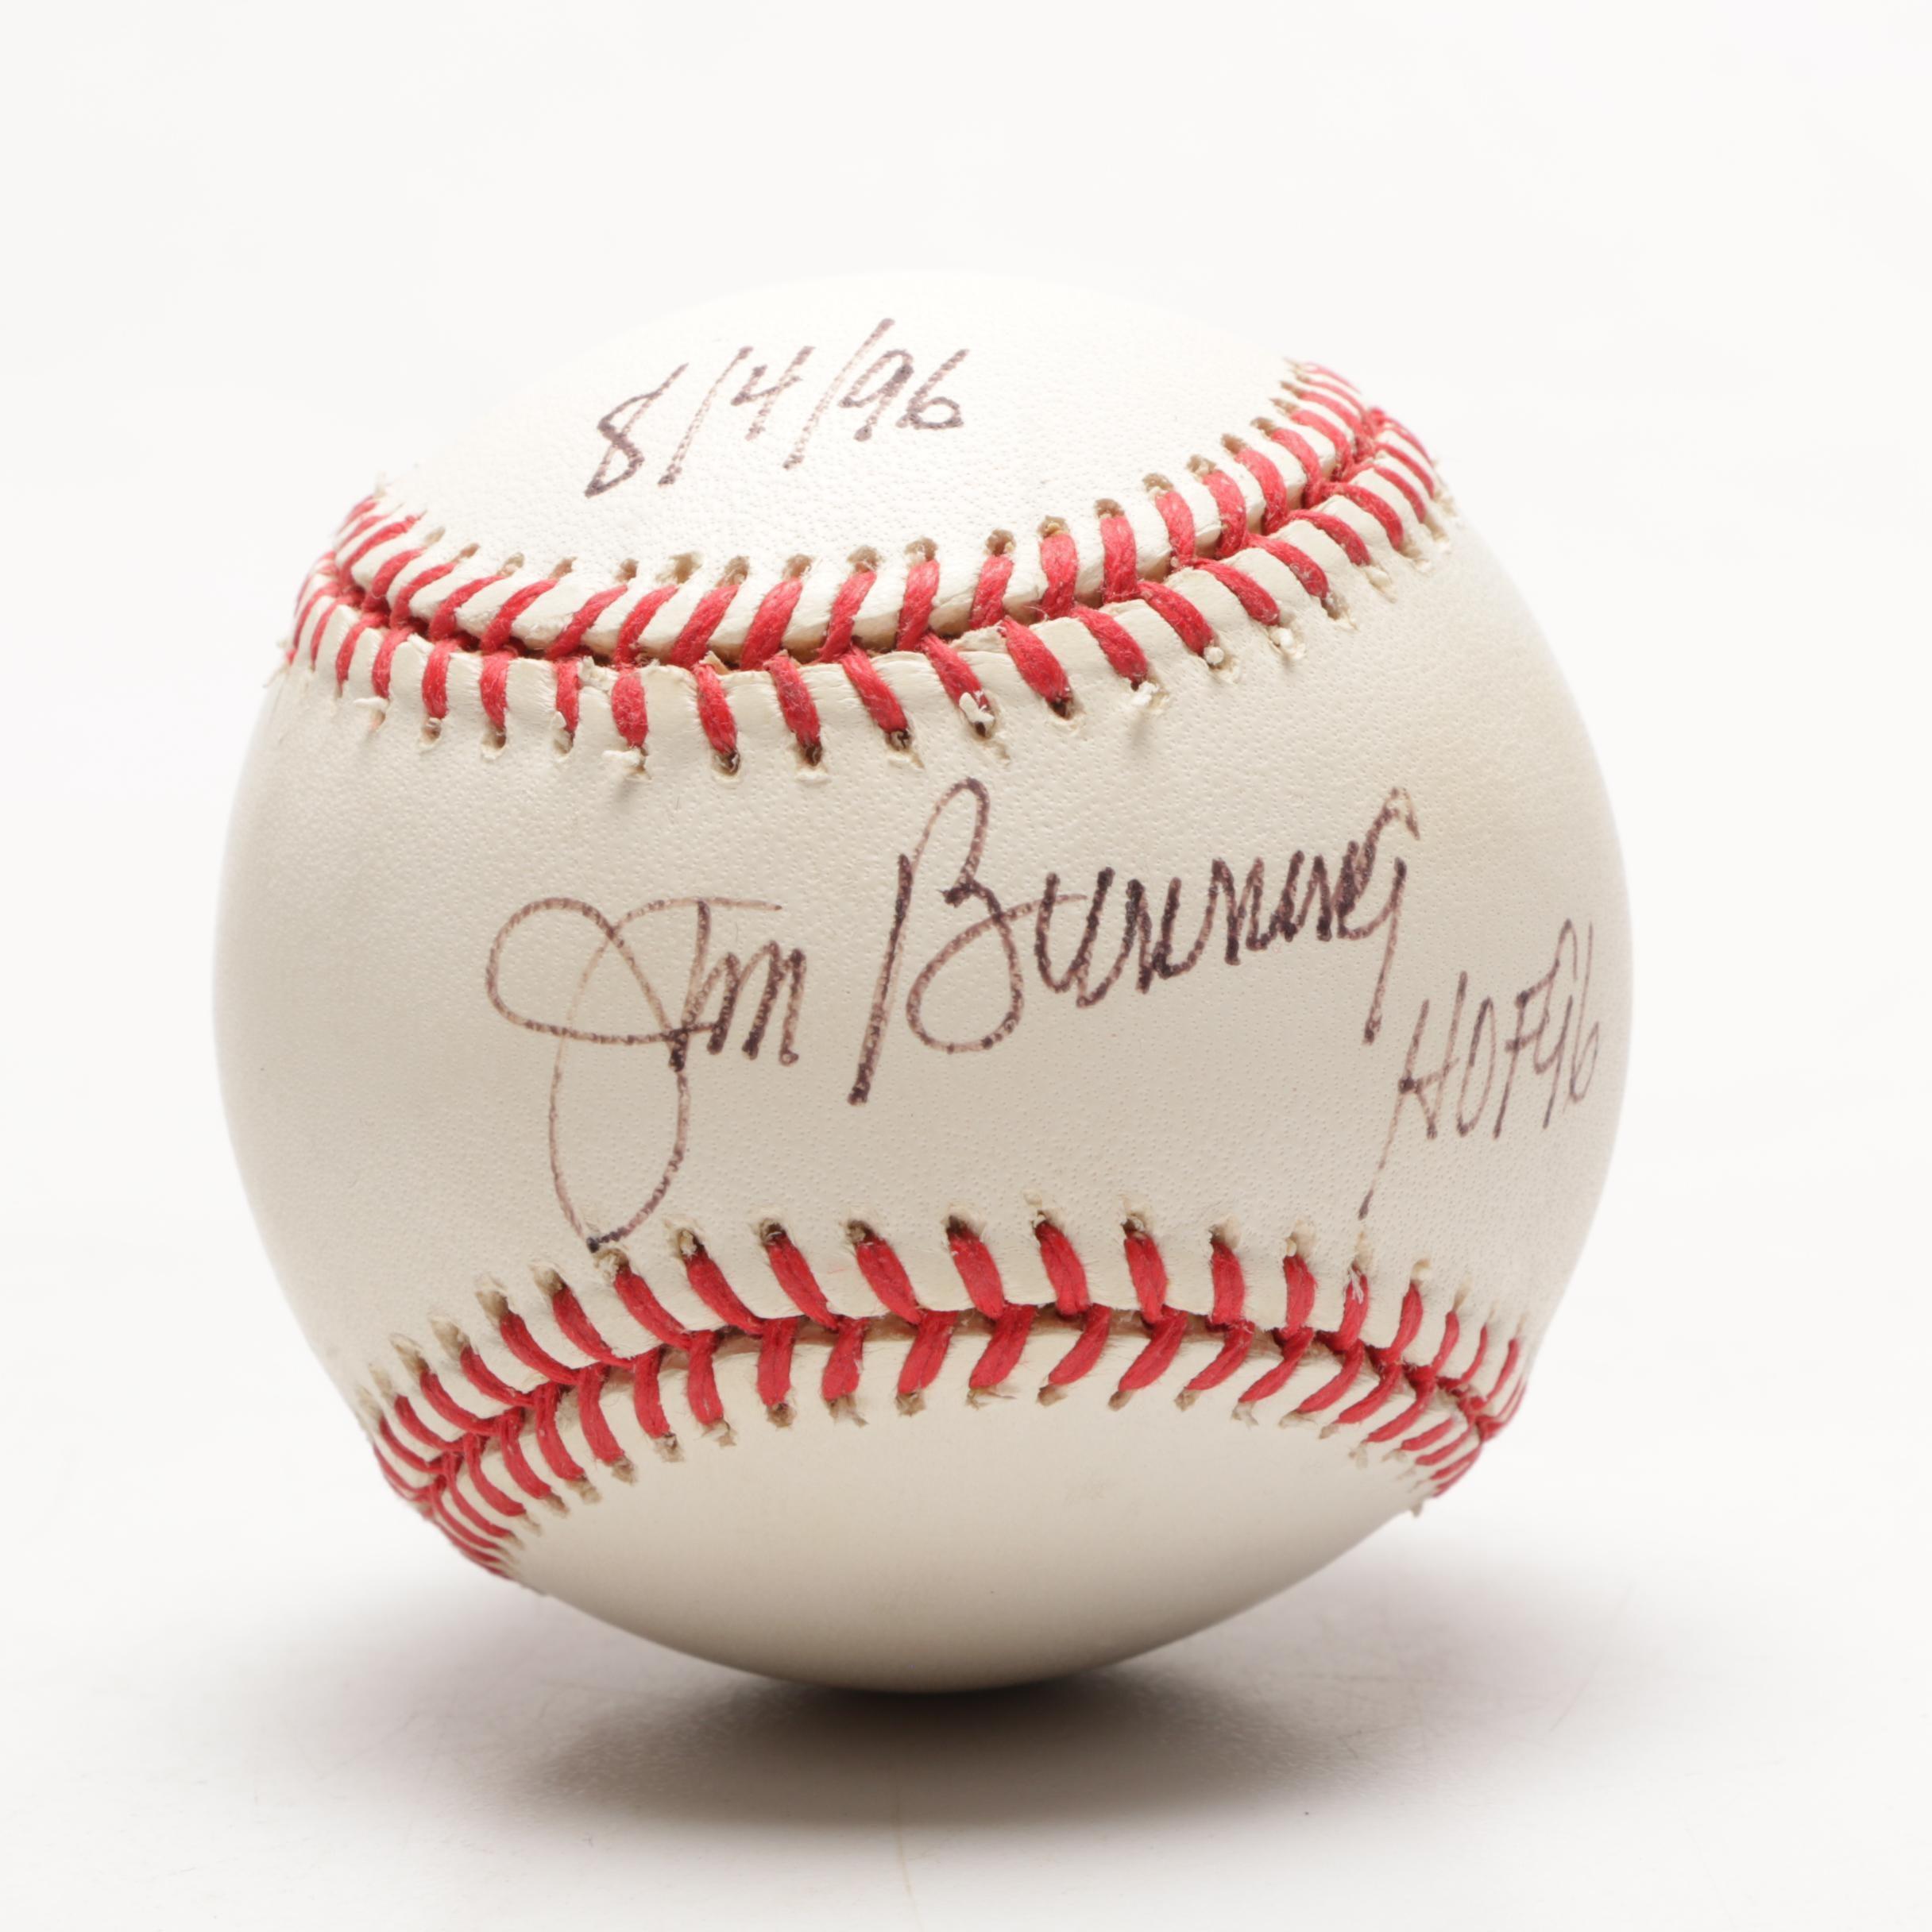 (HOF) Pitcher and U.S. Senator Jim Bunning Signed National League Baseball